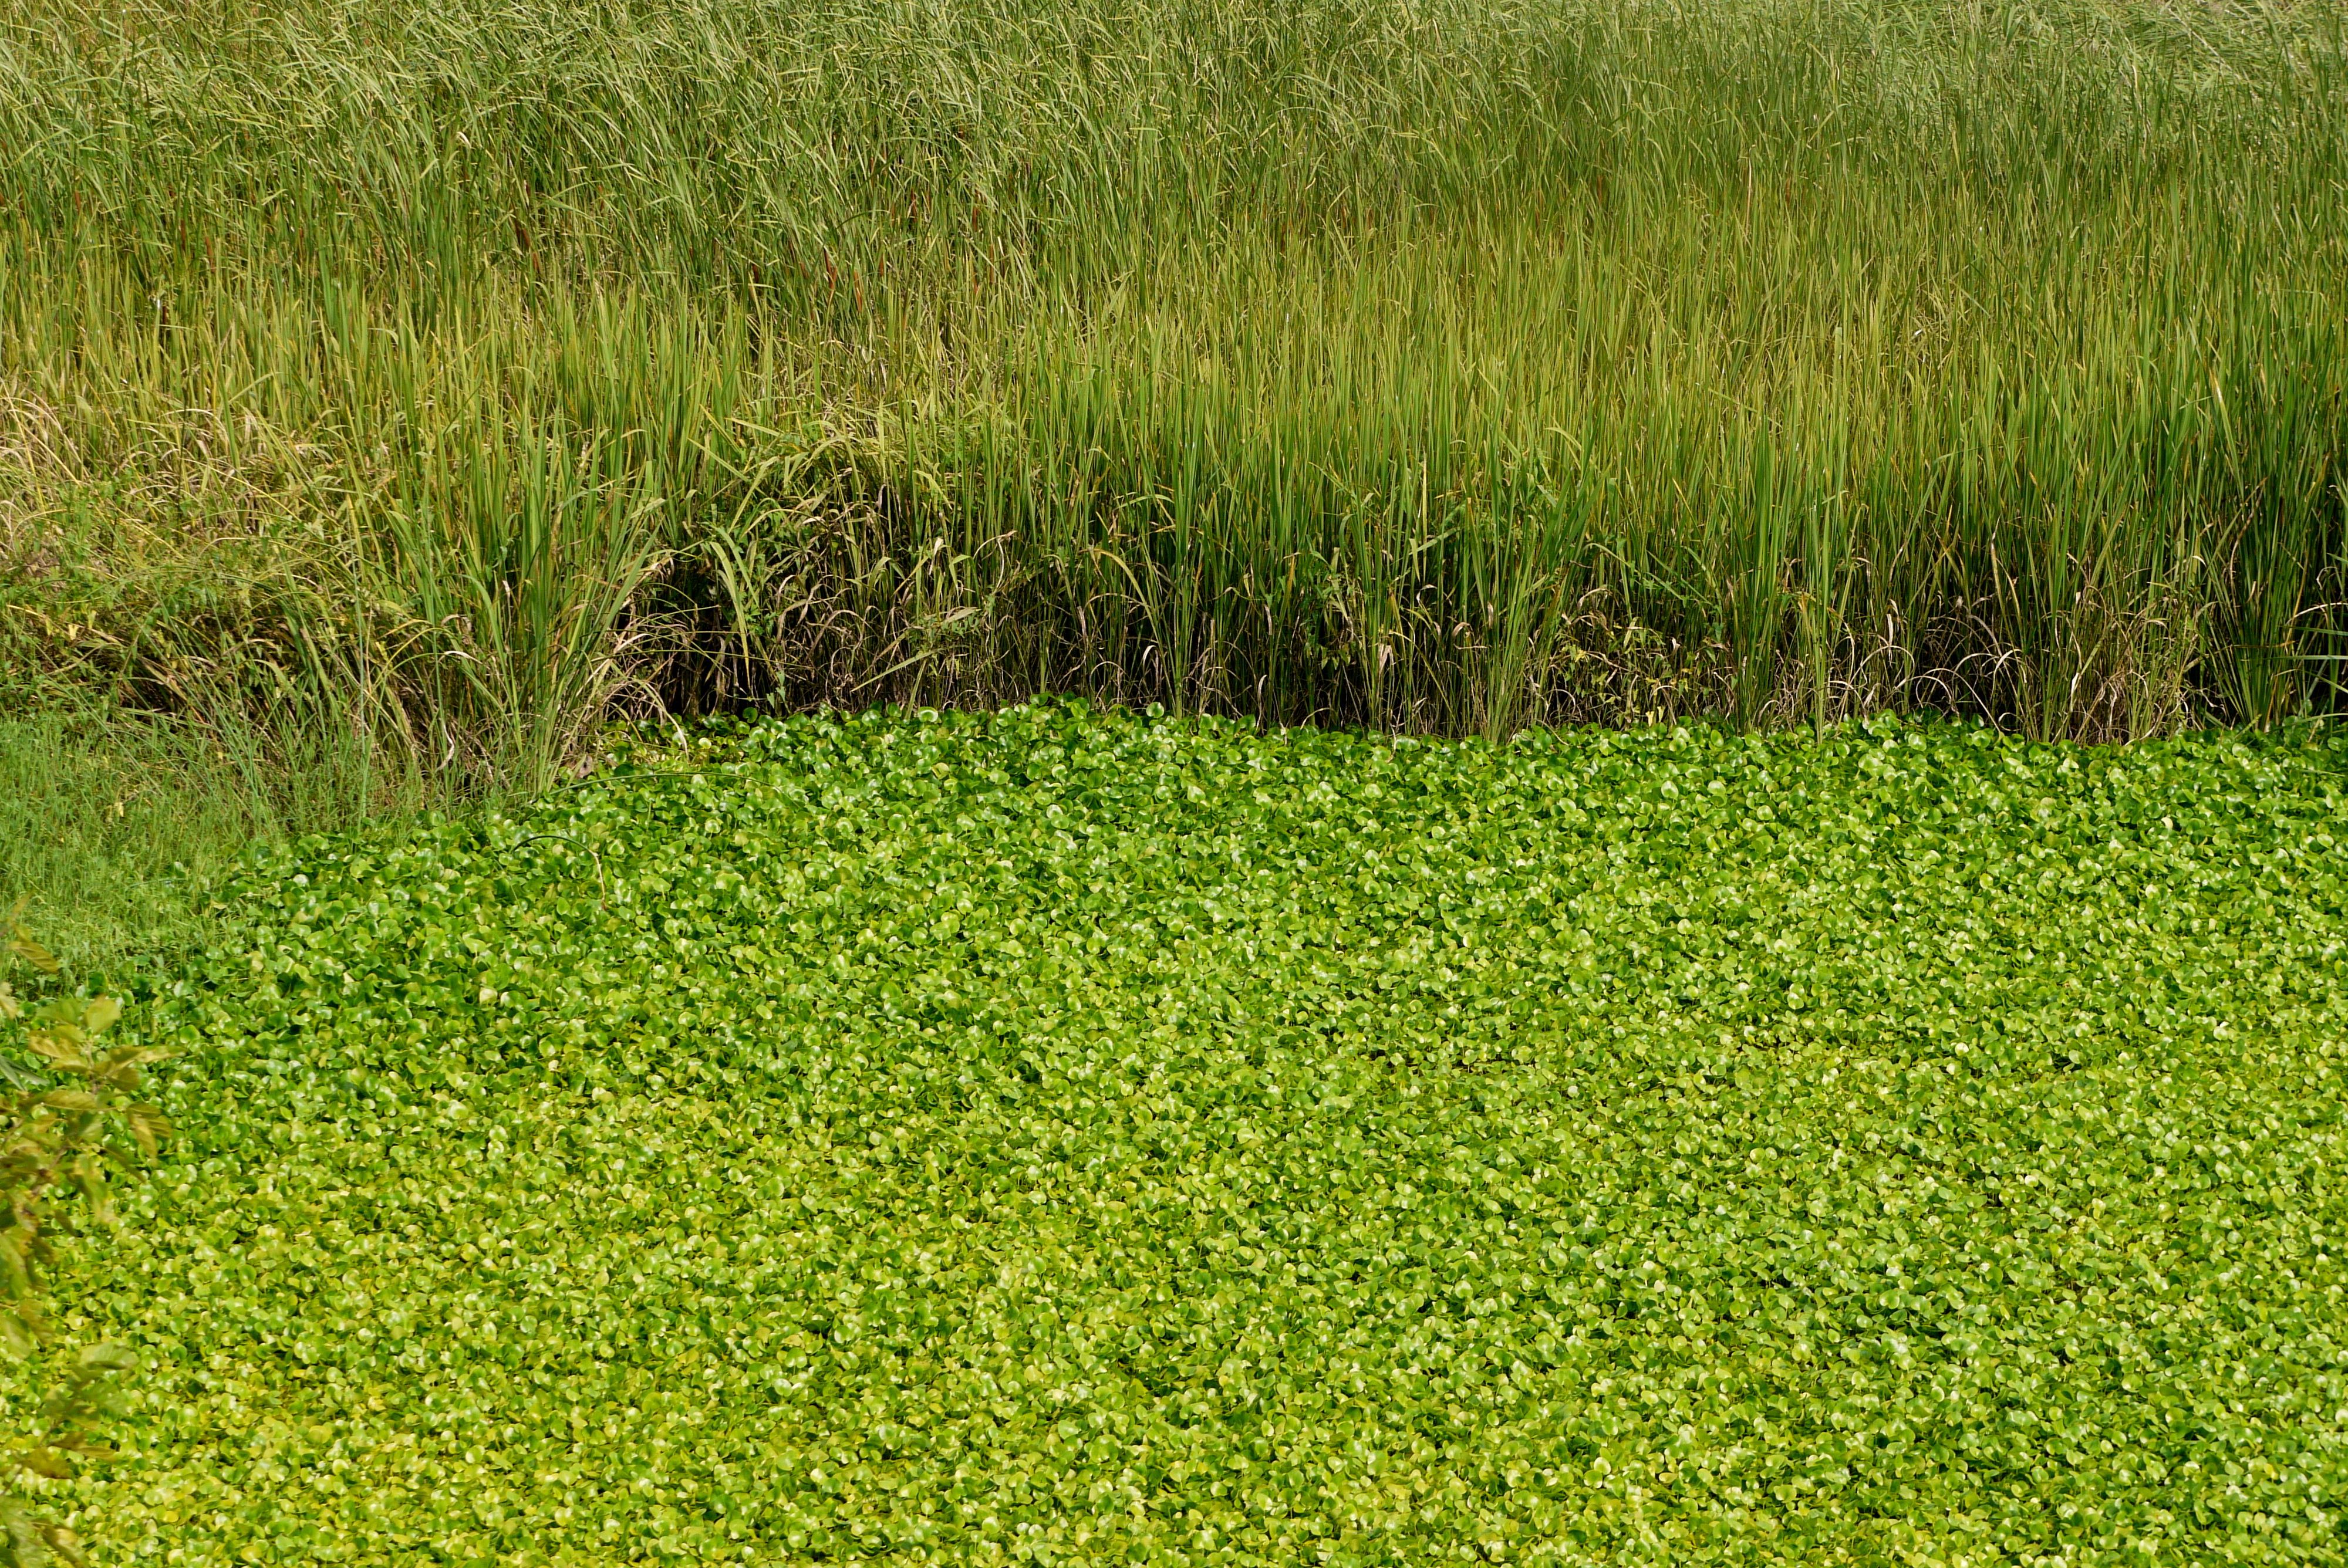 물풀로 가득찬 연못